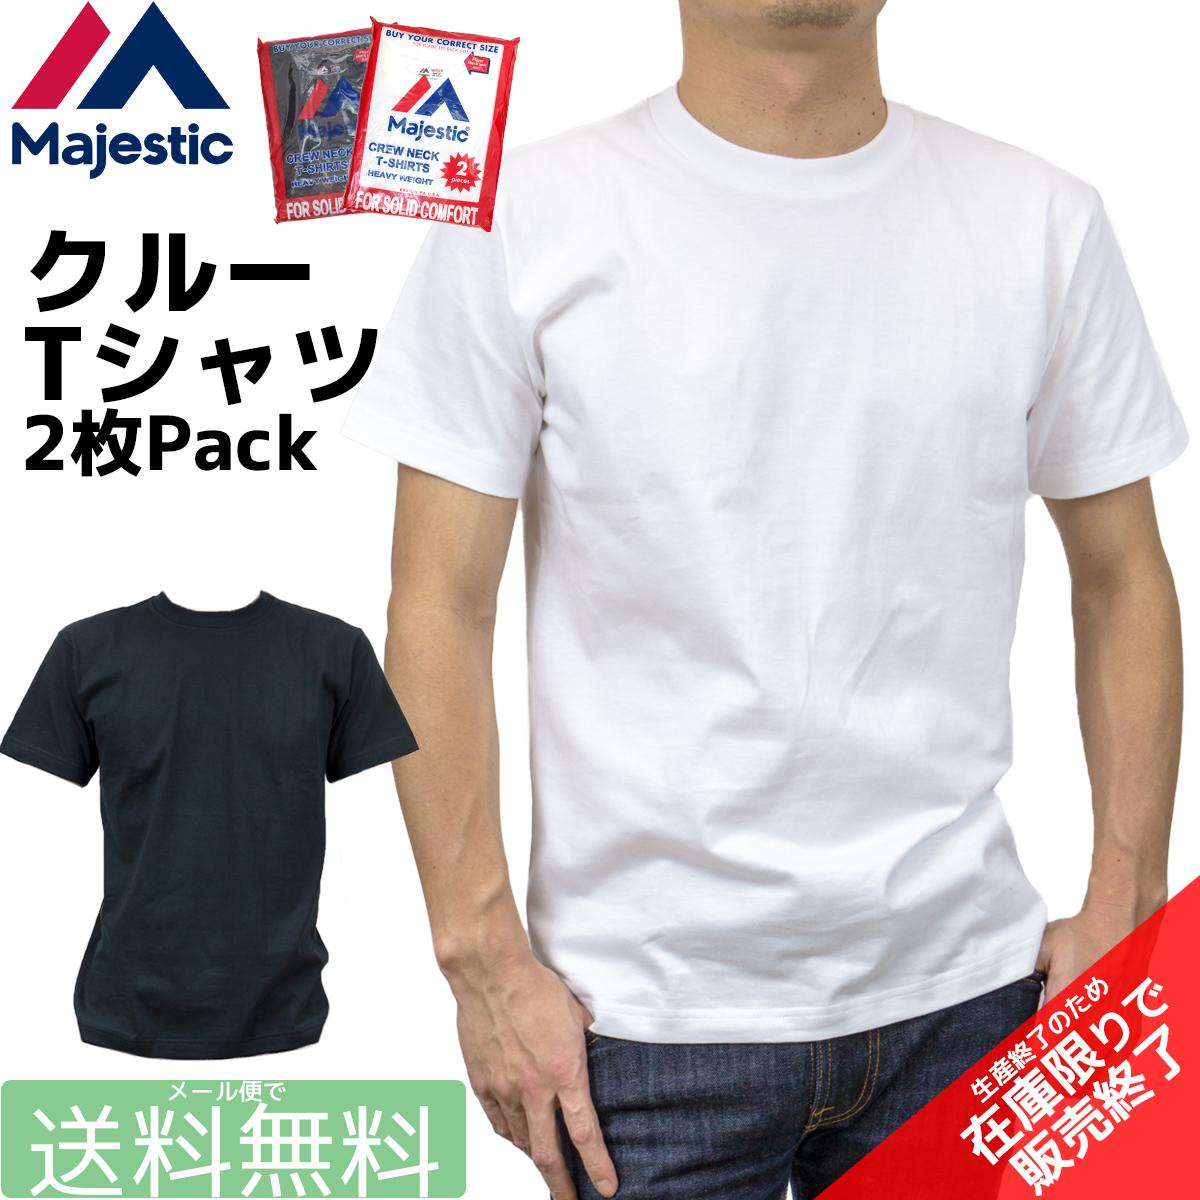 6cebb45bef0ec Majestic / マジェスティック / クルーネック 半袖 Tシャツ パックT 2枚パック